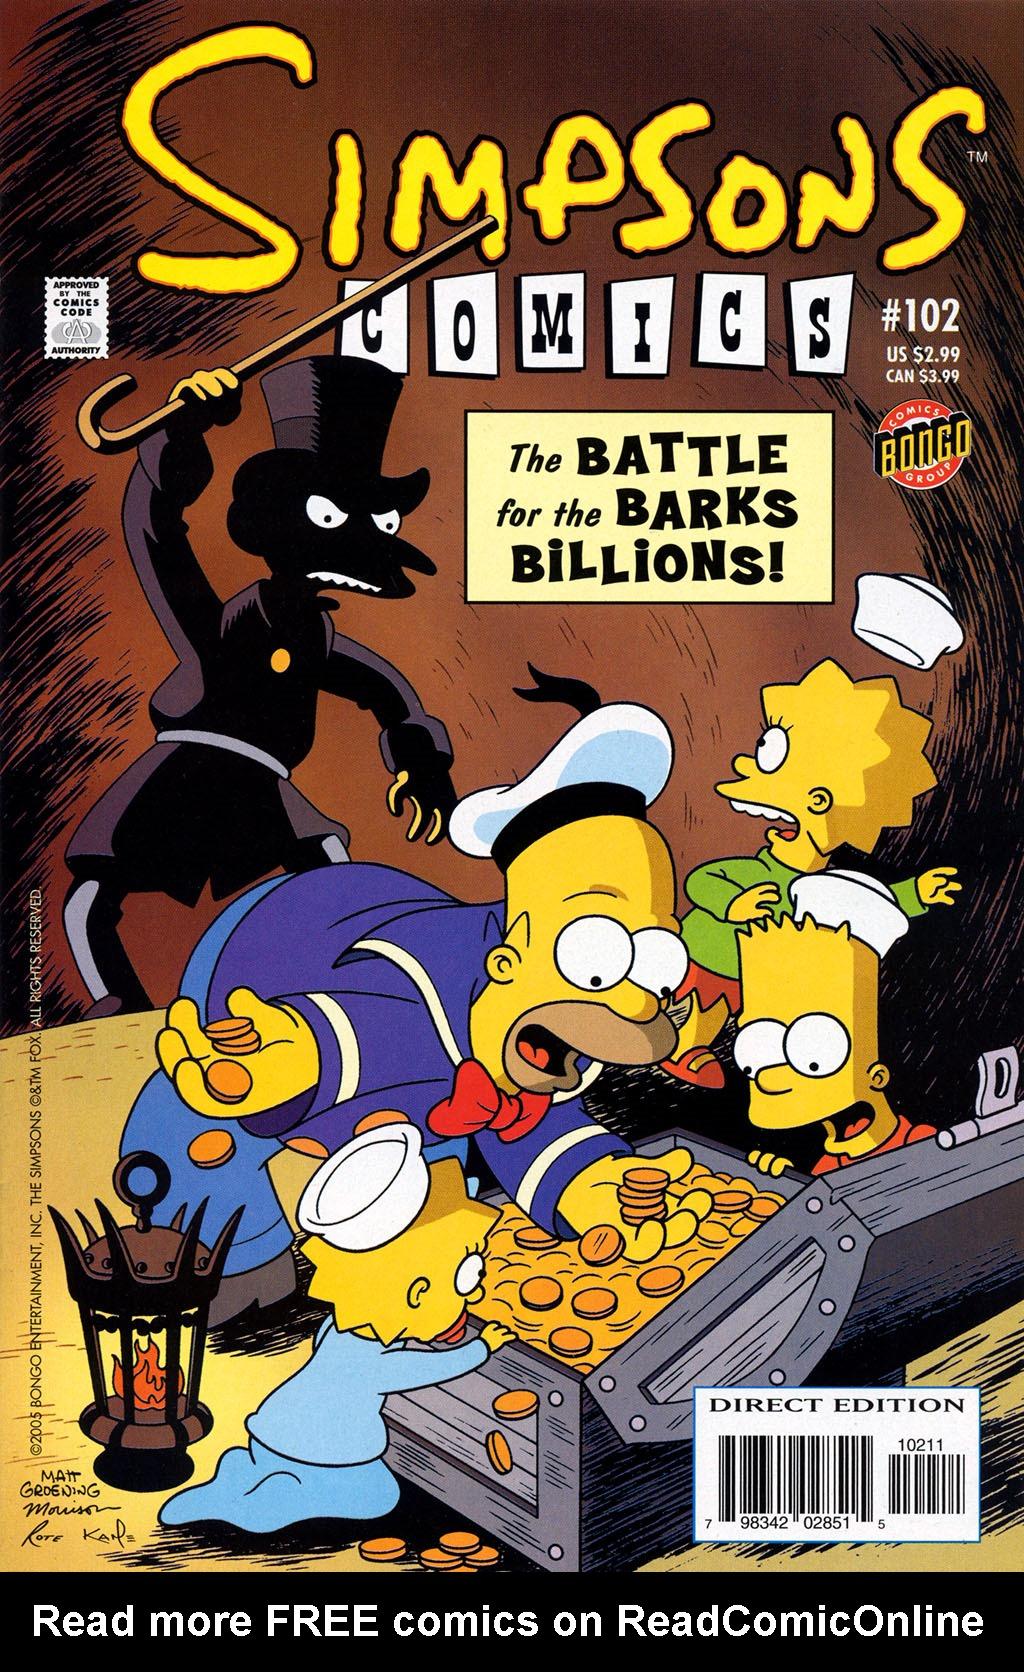 Read online Simpsons Comics comic -  Issue #102 - 1